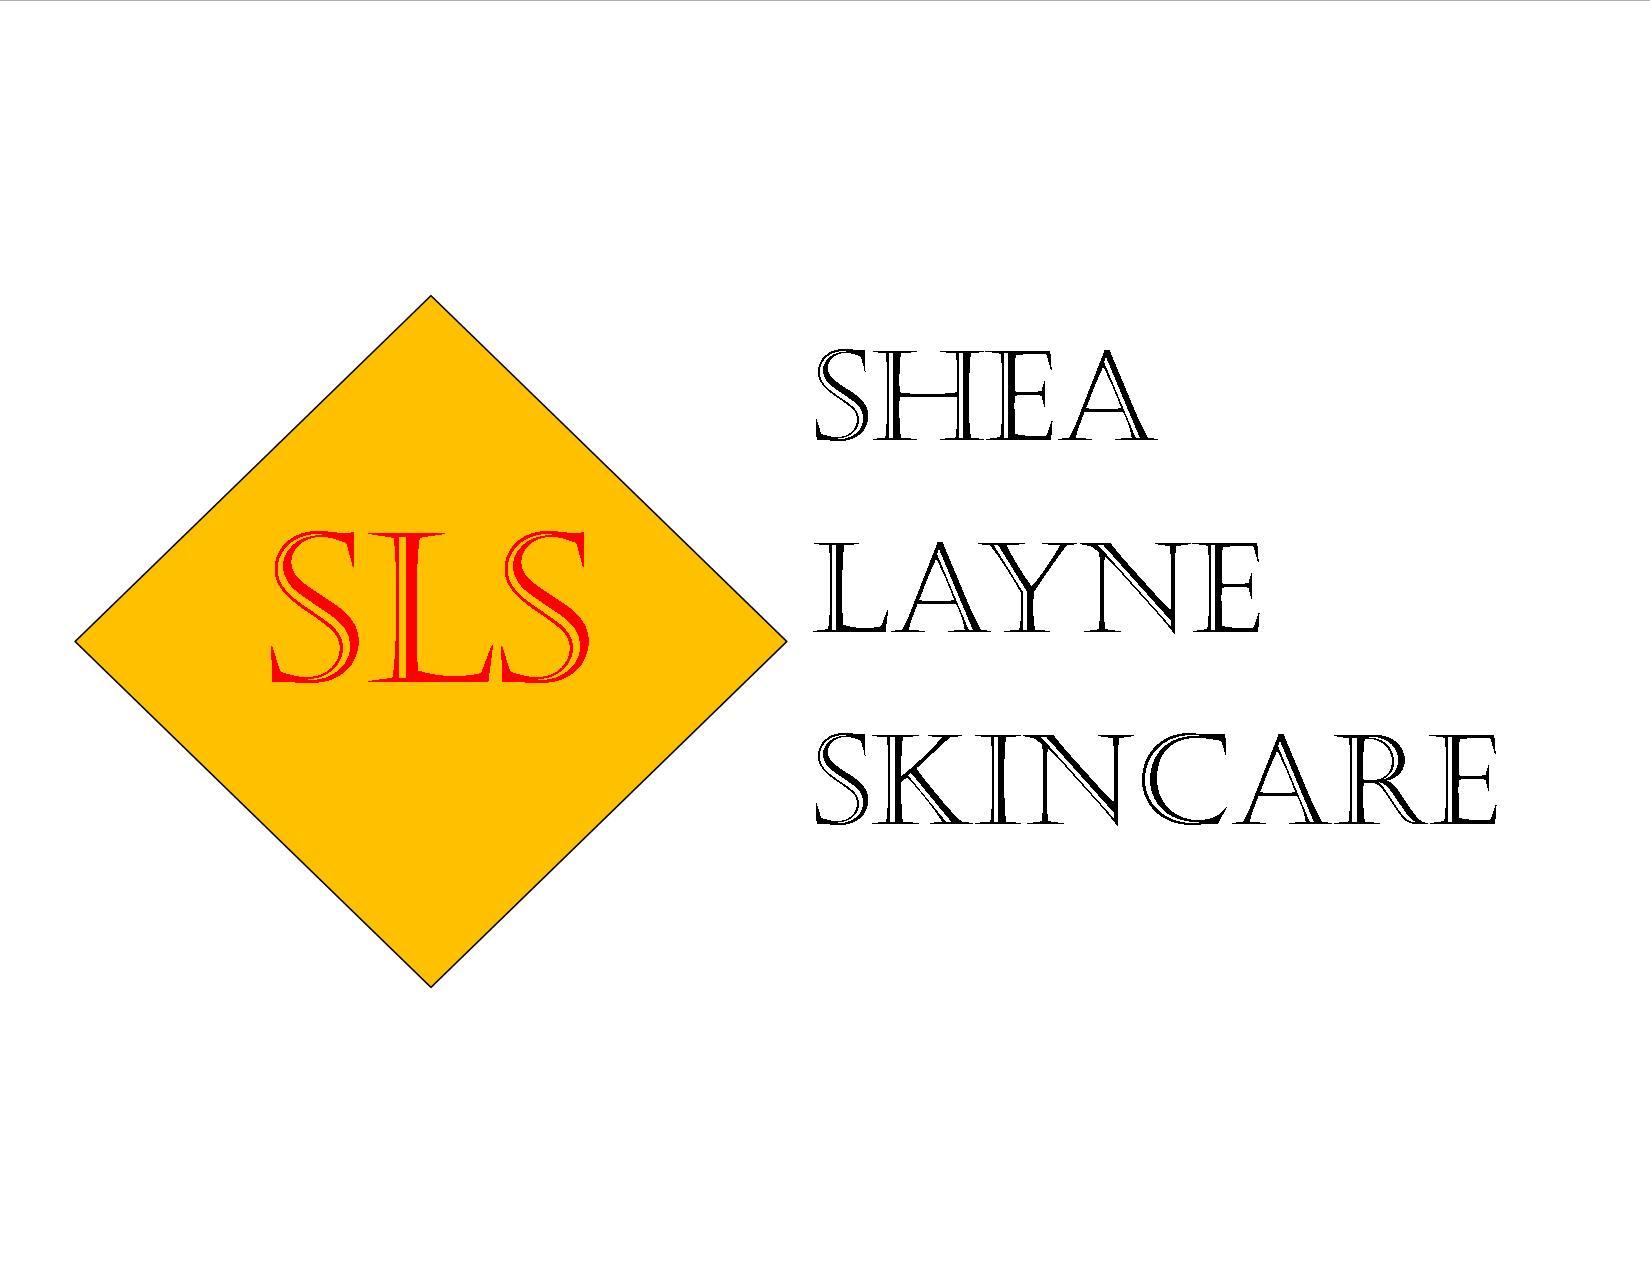 Shea Layne Skincare